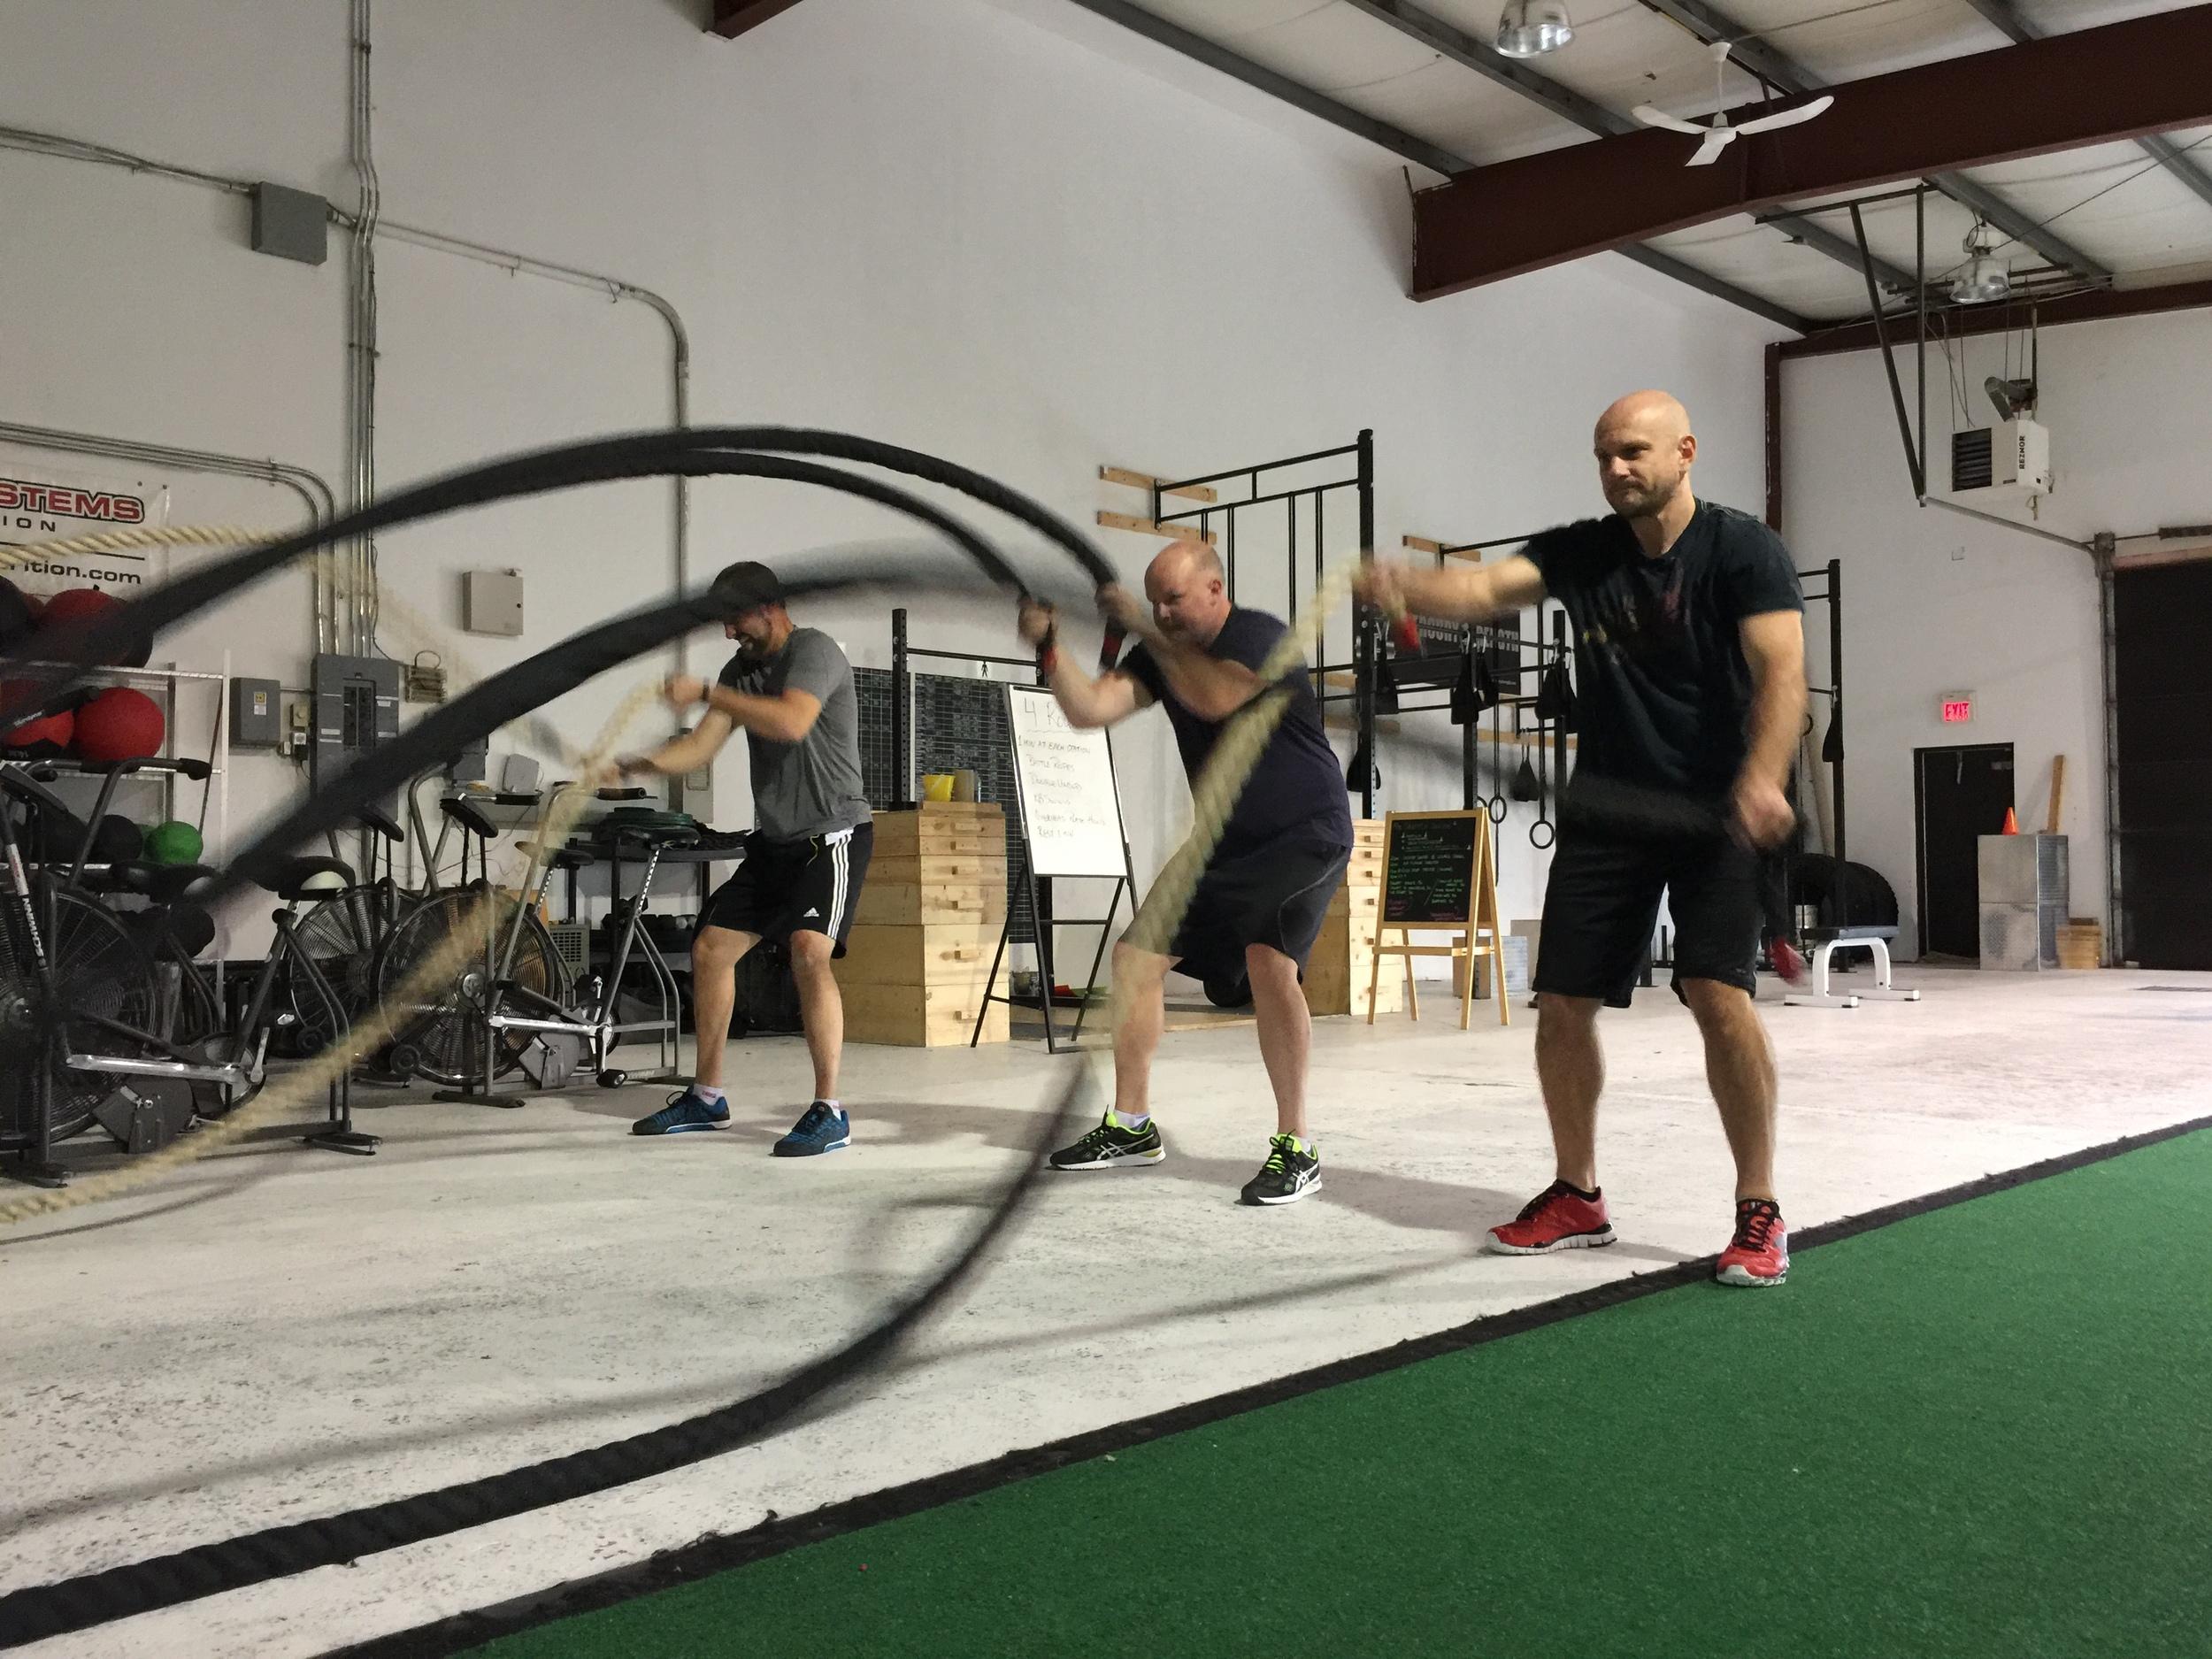 gym-fitness-training-bootcamp-kingston-battle rope